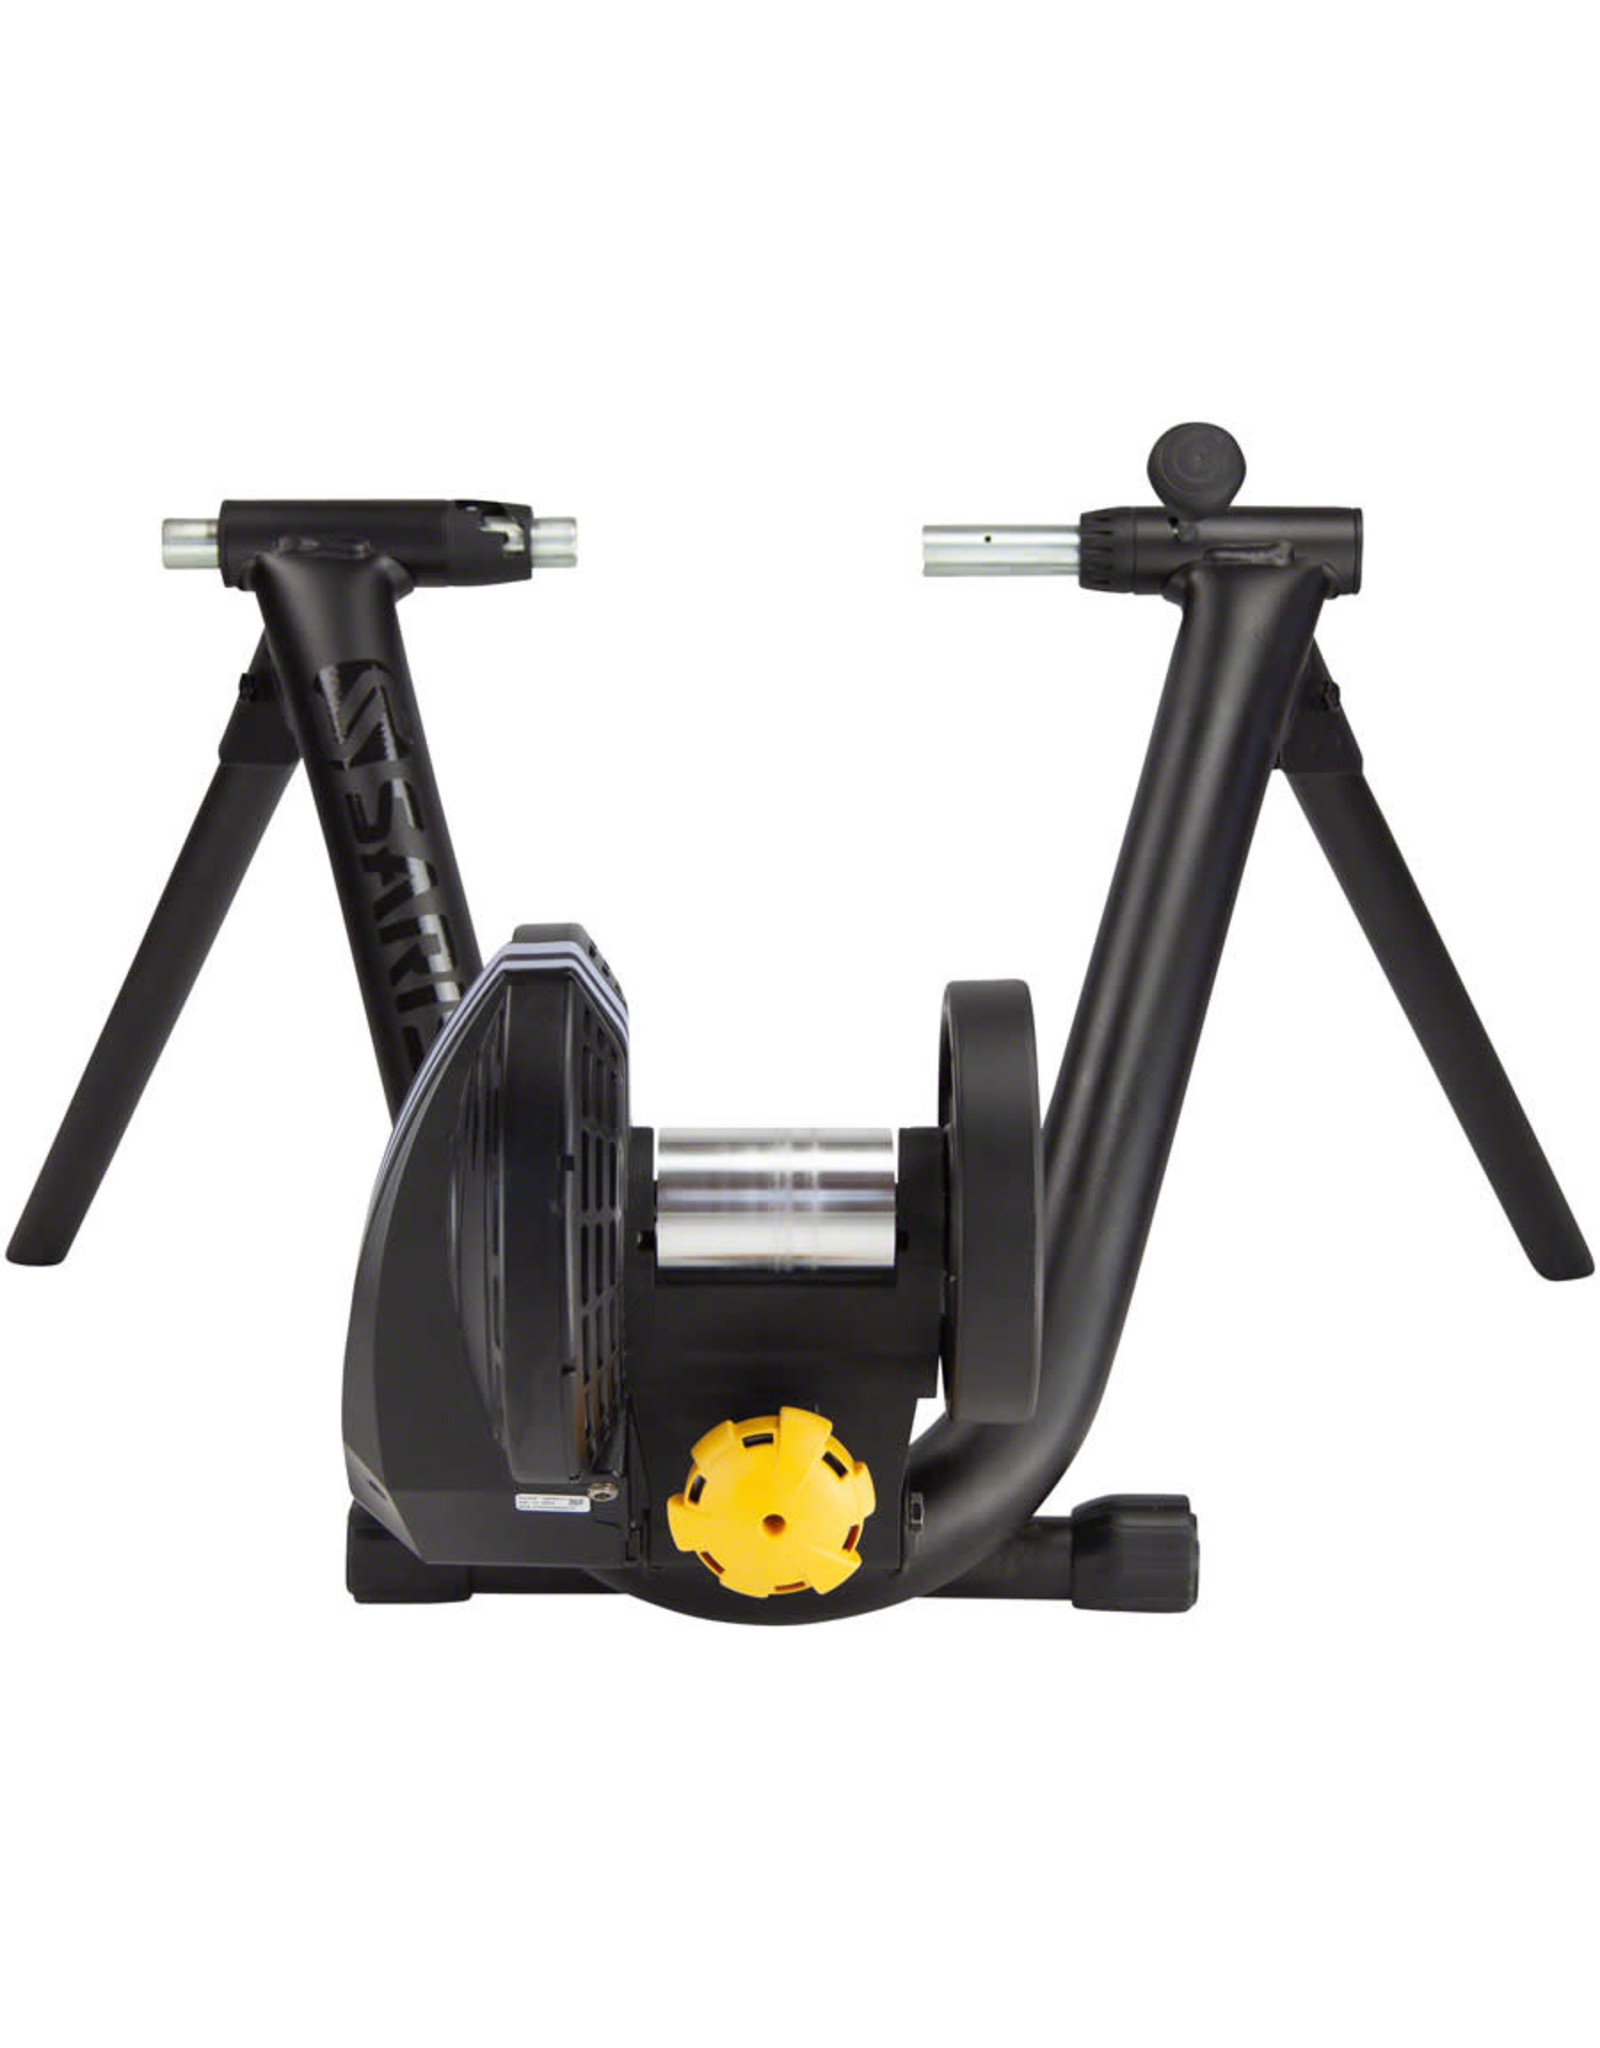 Saris Saris - M2 Smart Trainer - Electronic Resistance, Adjustable